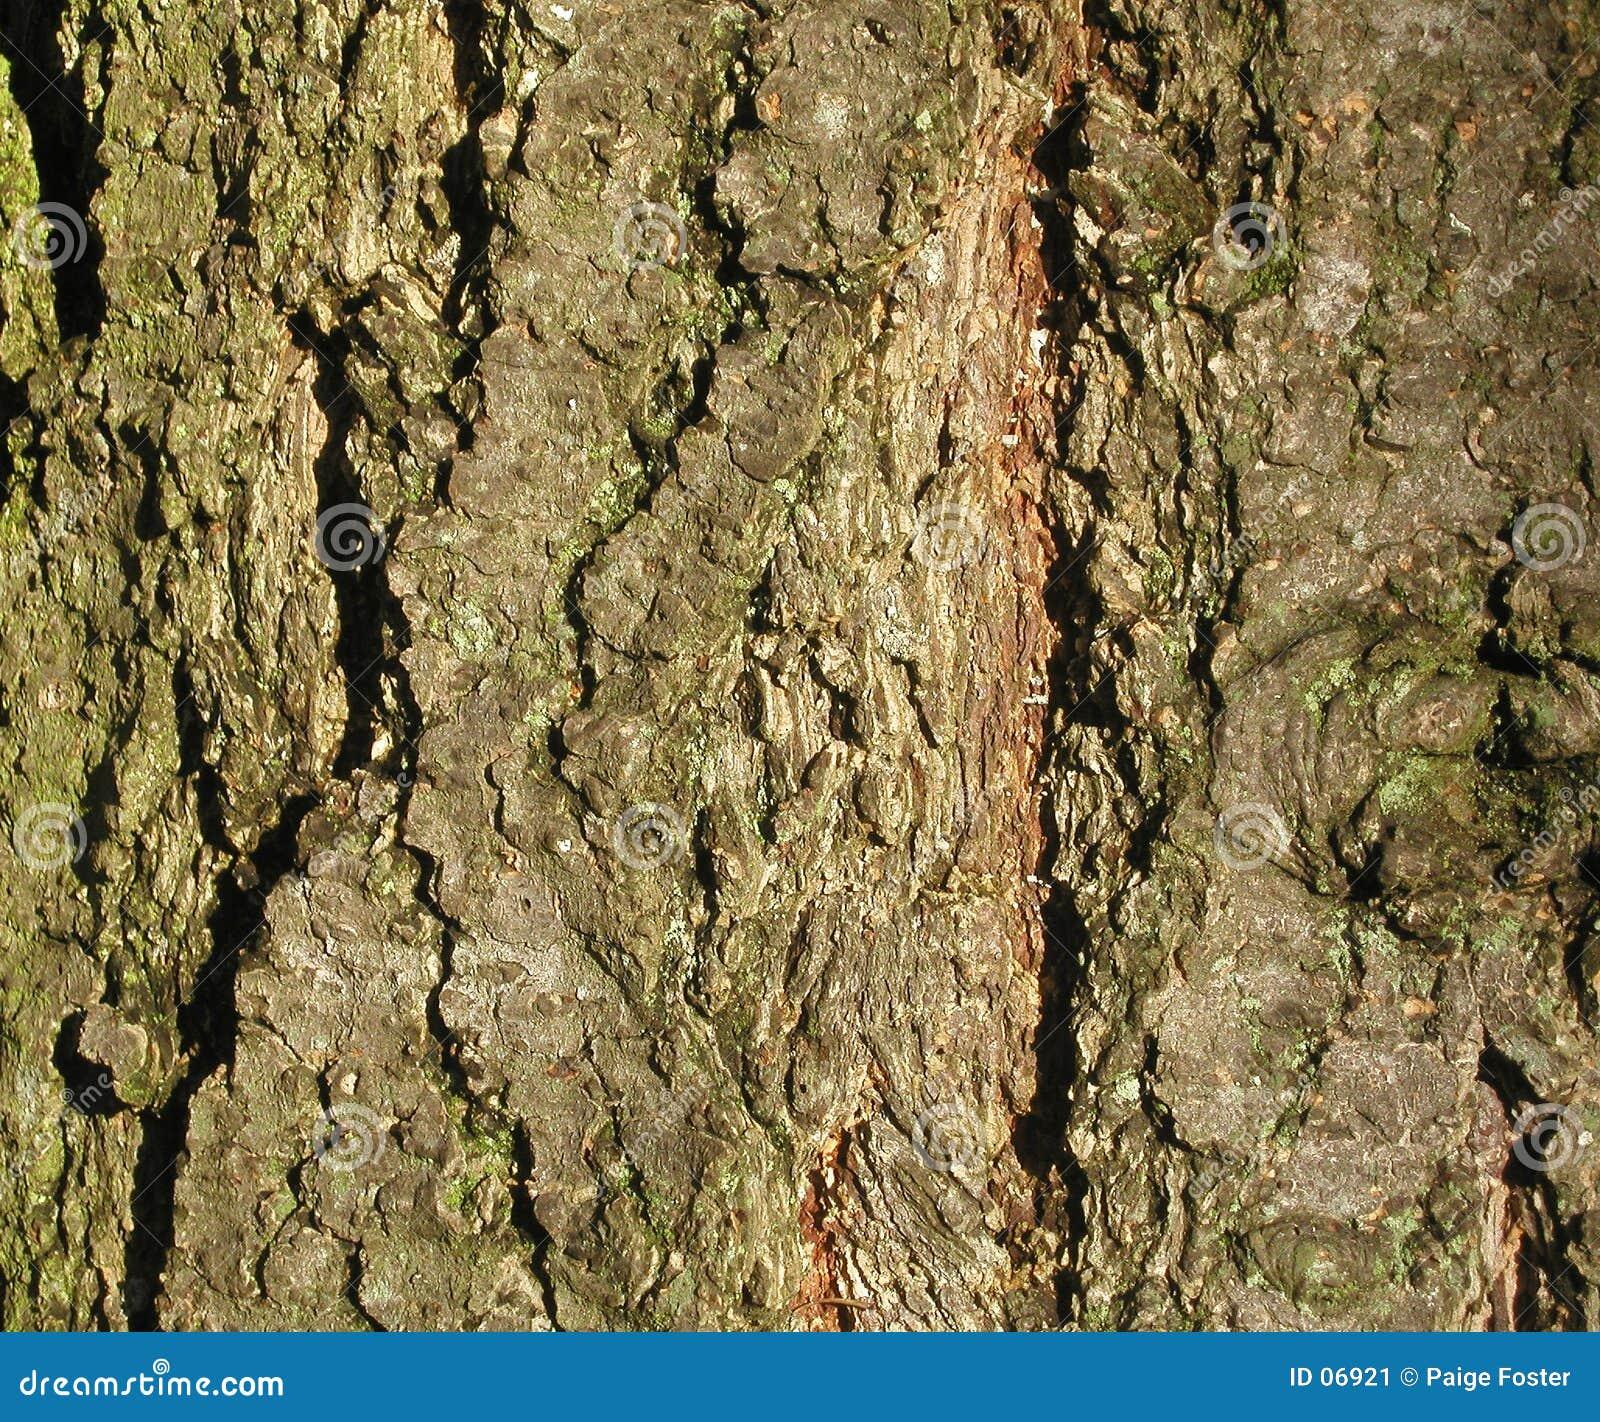 Textura da casca de árvore